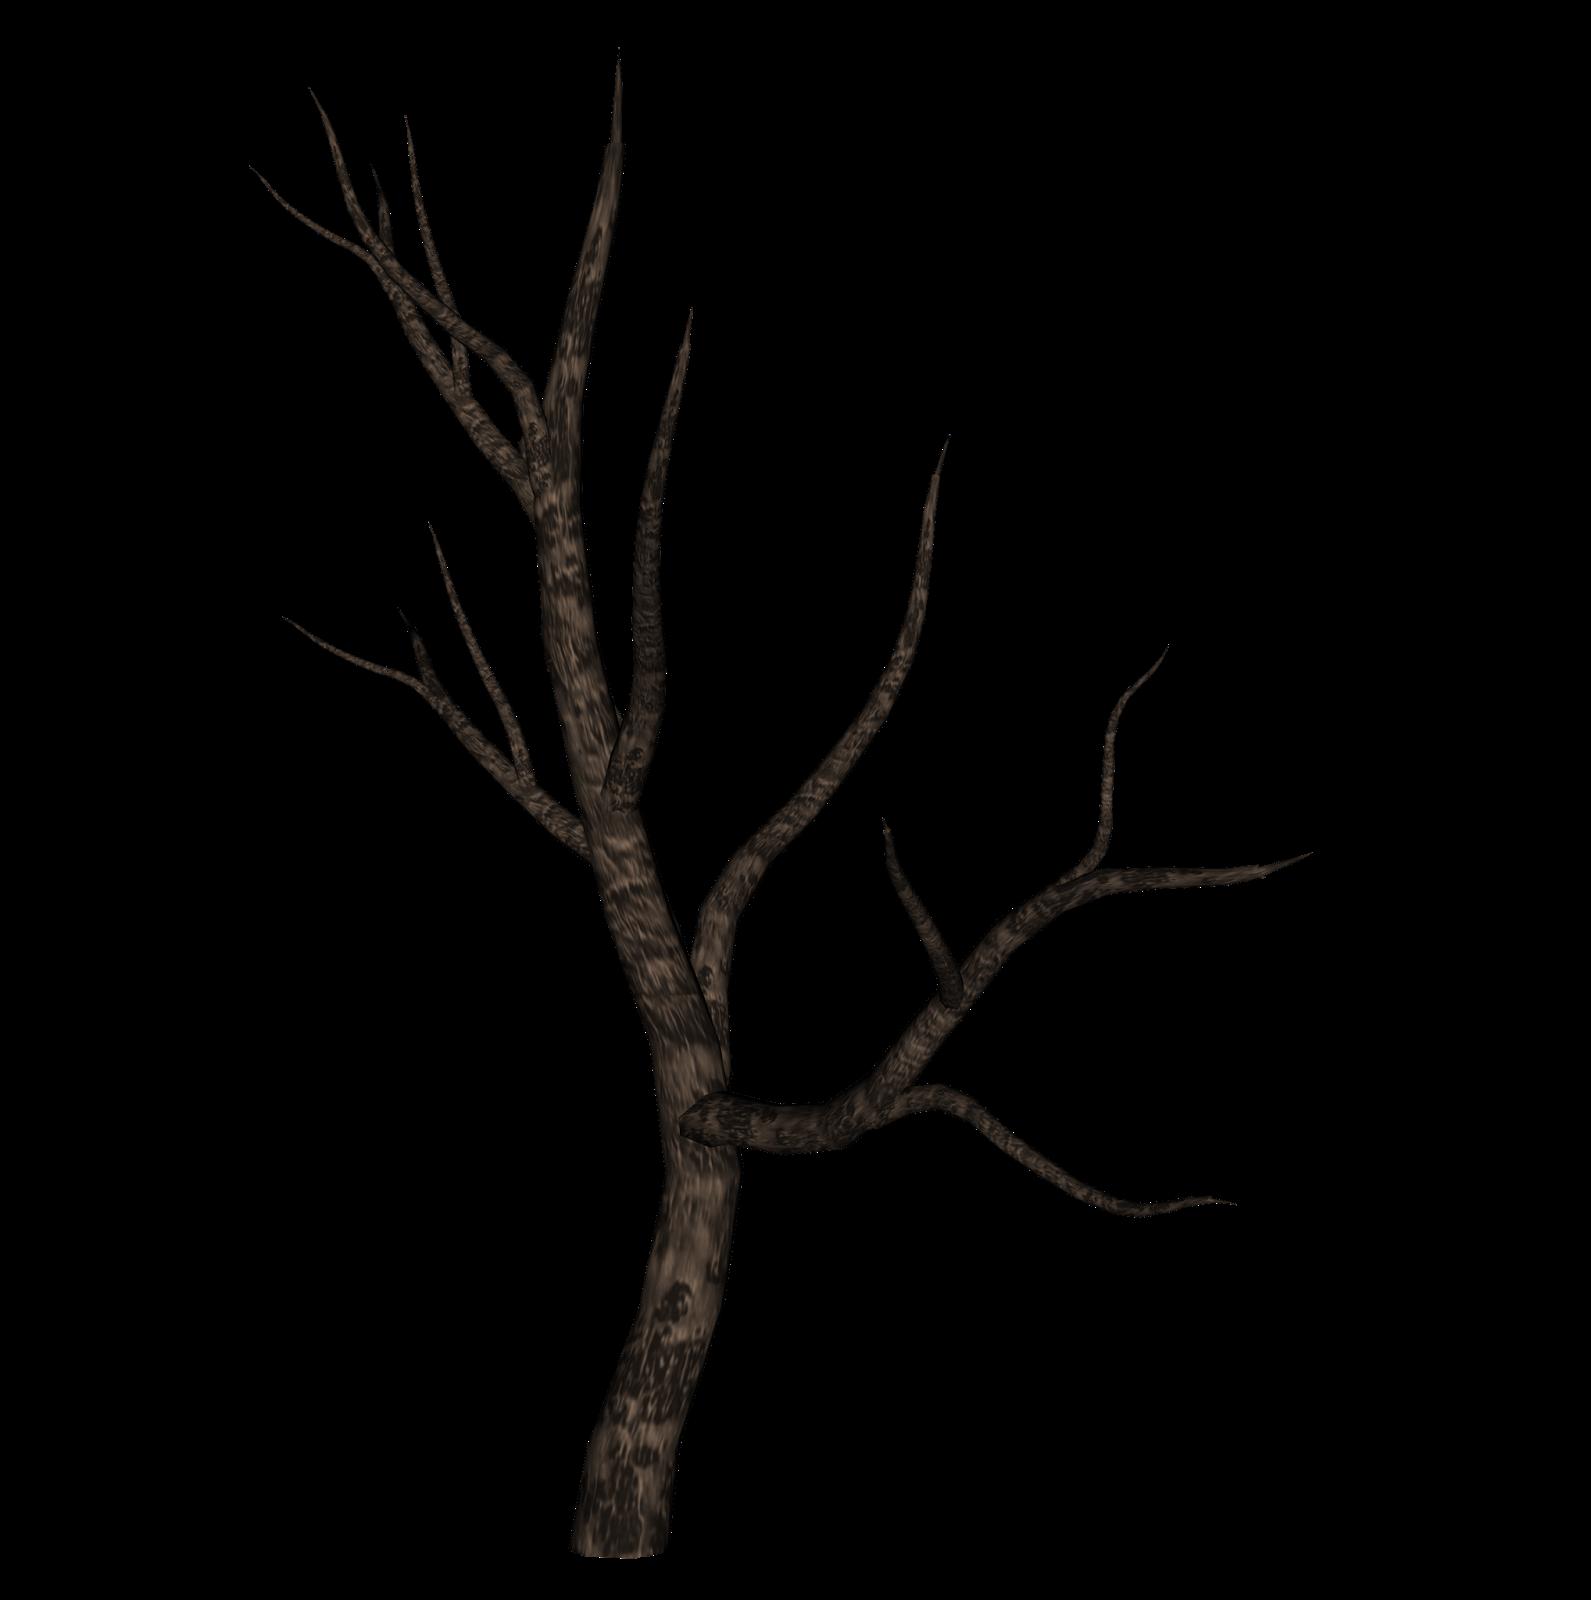 Картинки ветки дерева